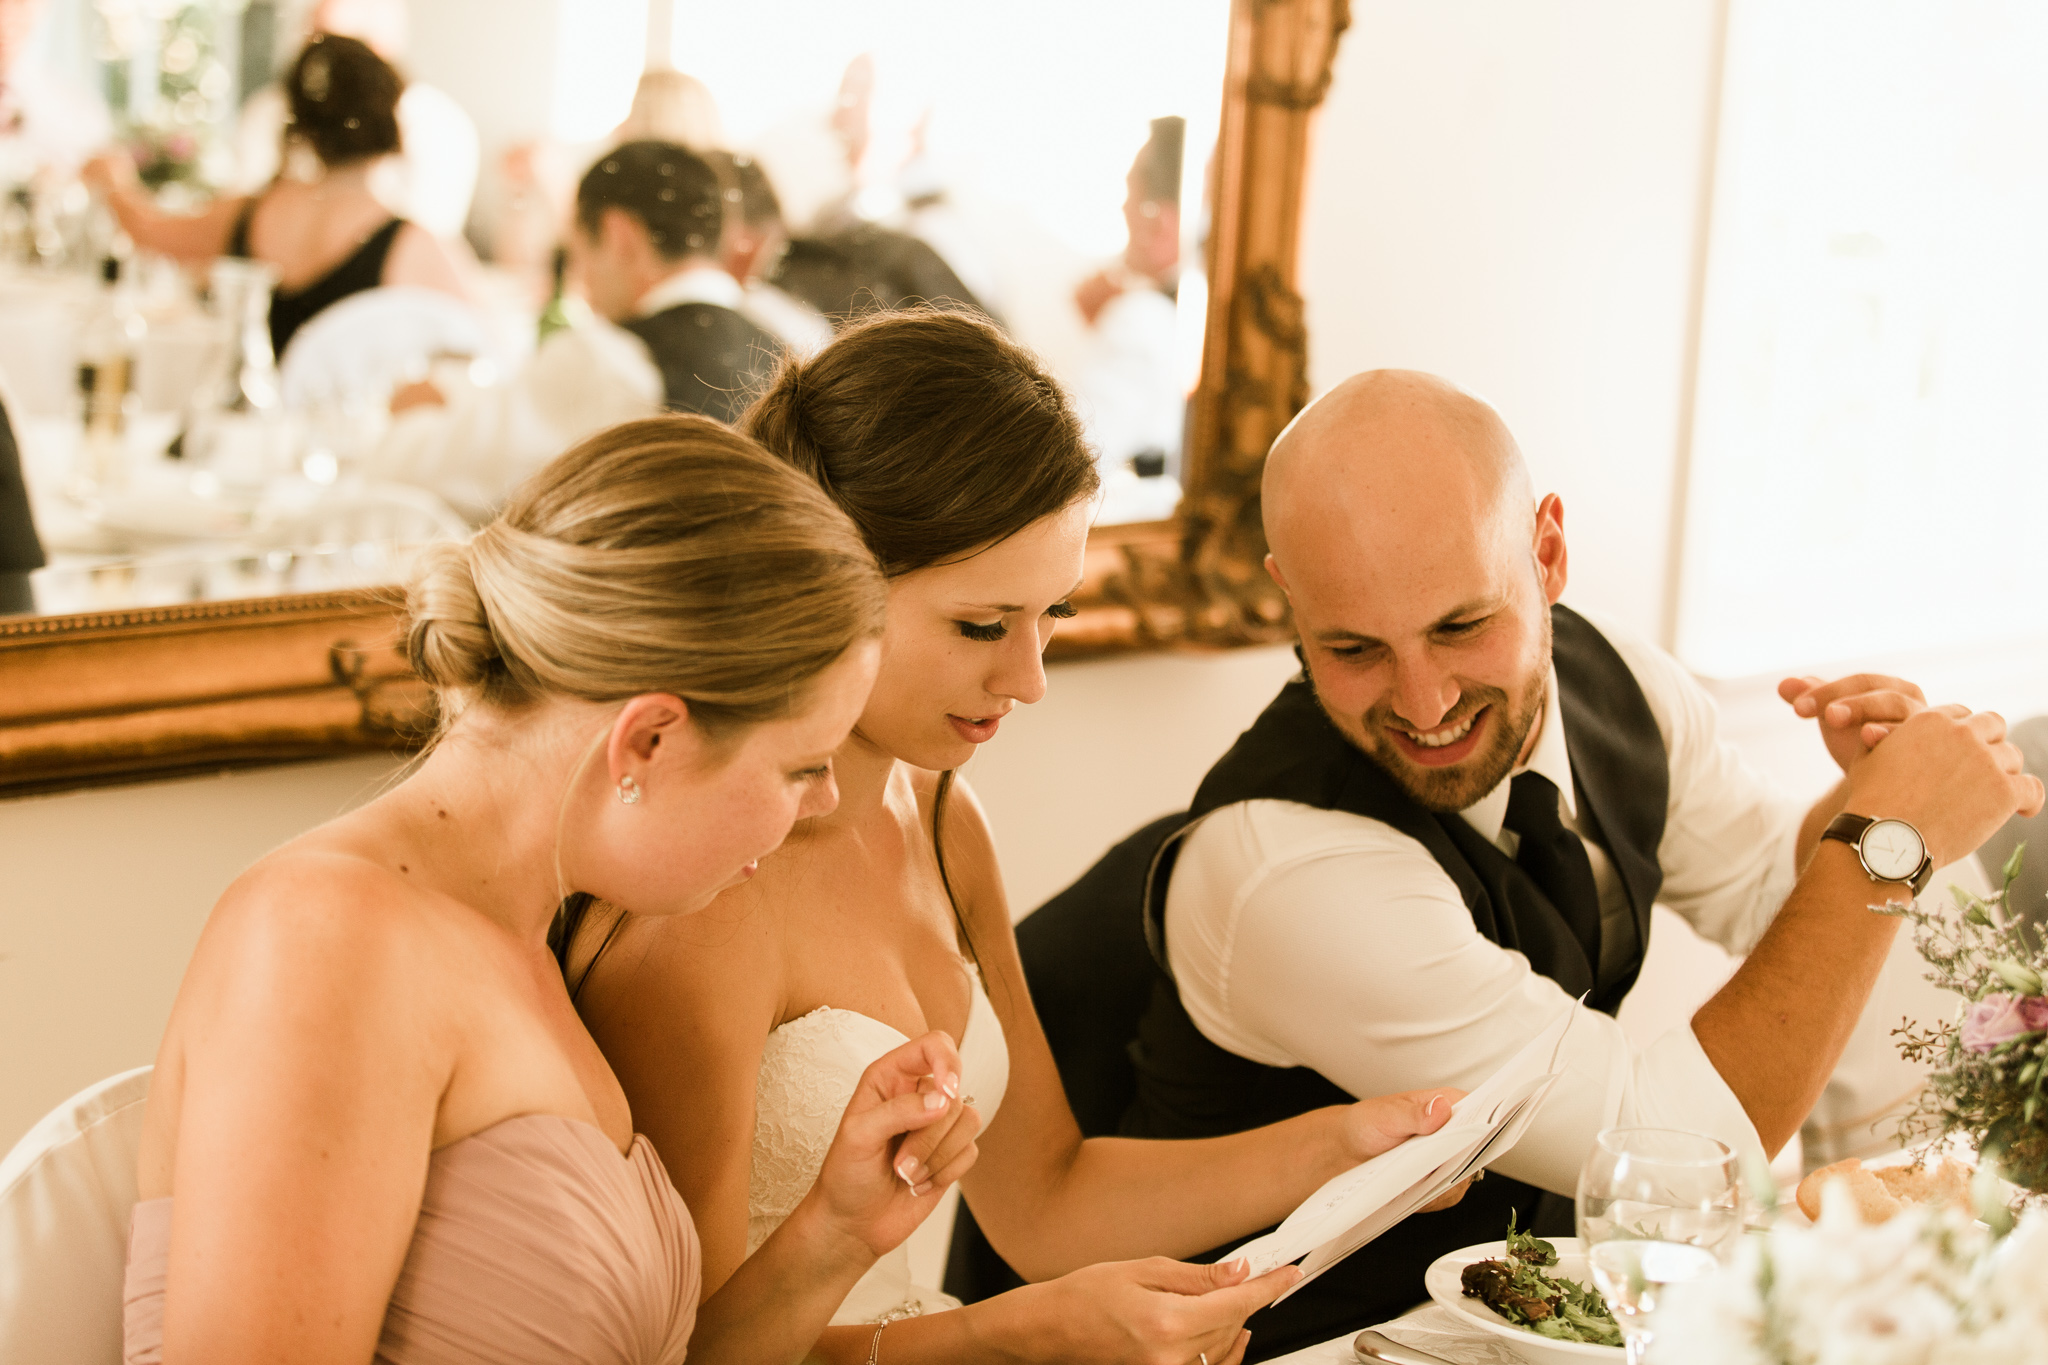 springer-house-burlington-wedding-photographer-527-of-756.jpg